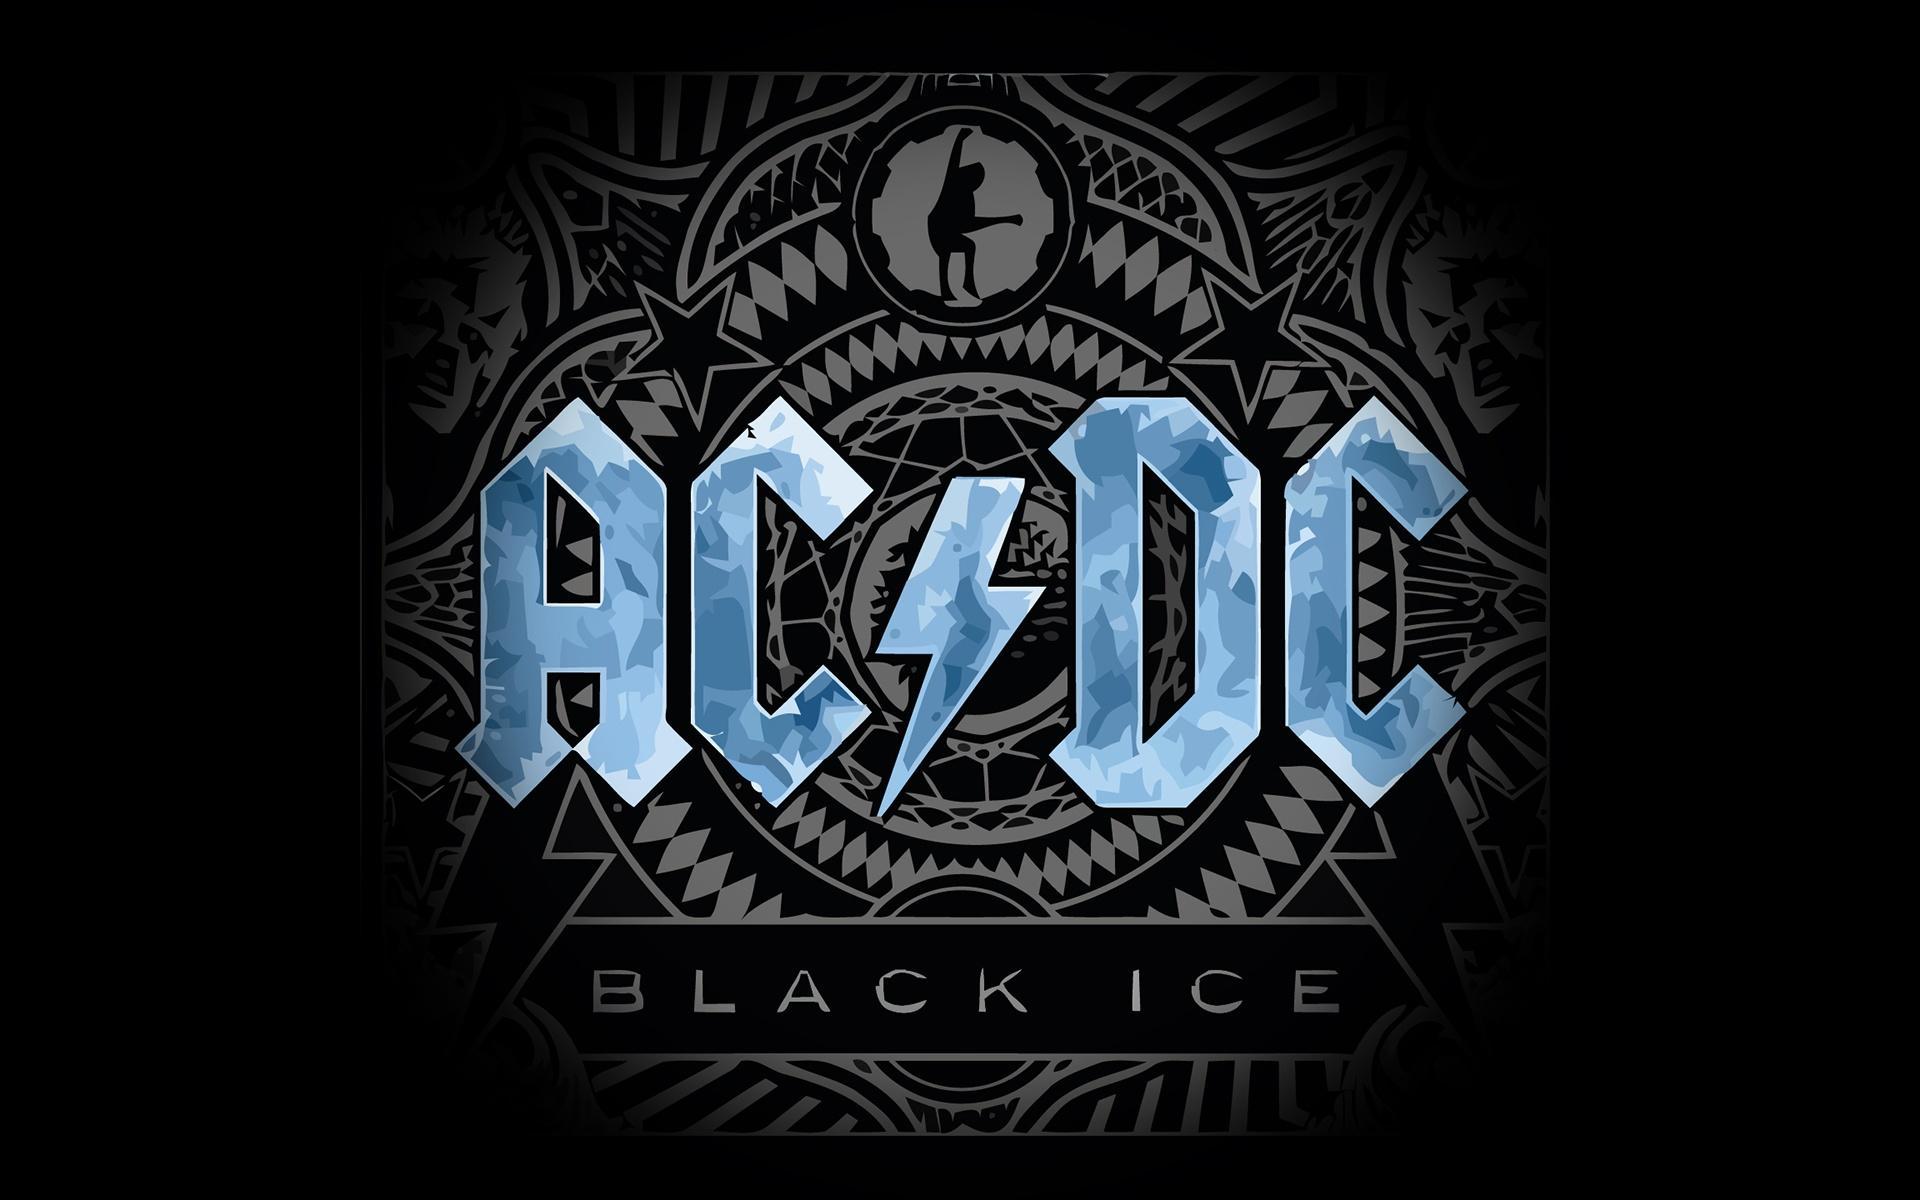 Ac Dc Black Ice Concept Art Fond D Ecran Hd Arriere Plan 1920x1200 Id 422778 Wallpaper Abyss